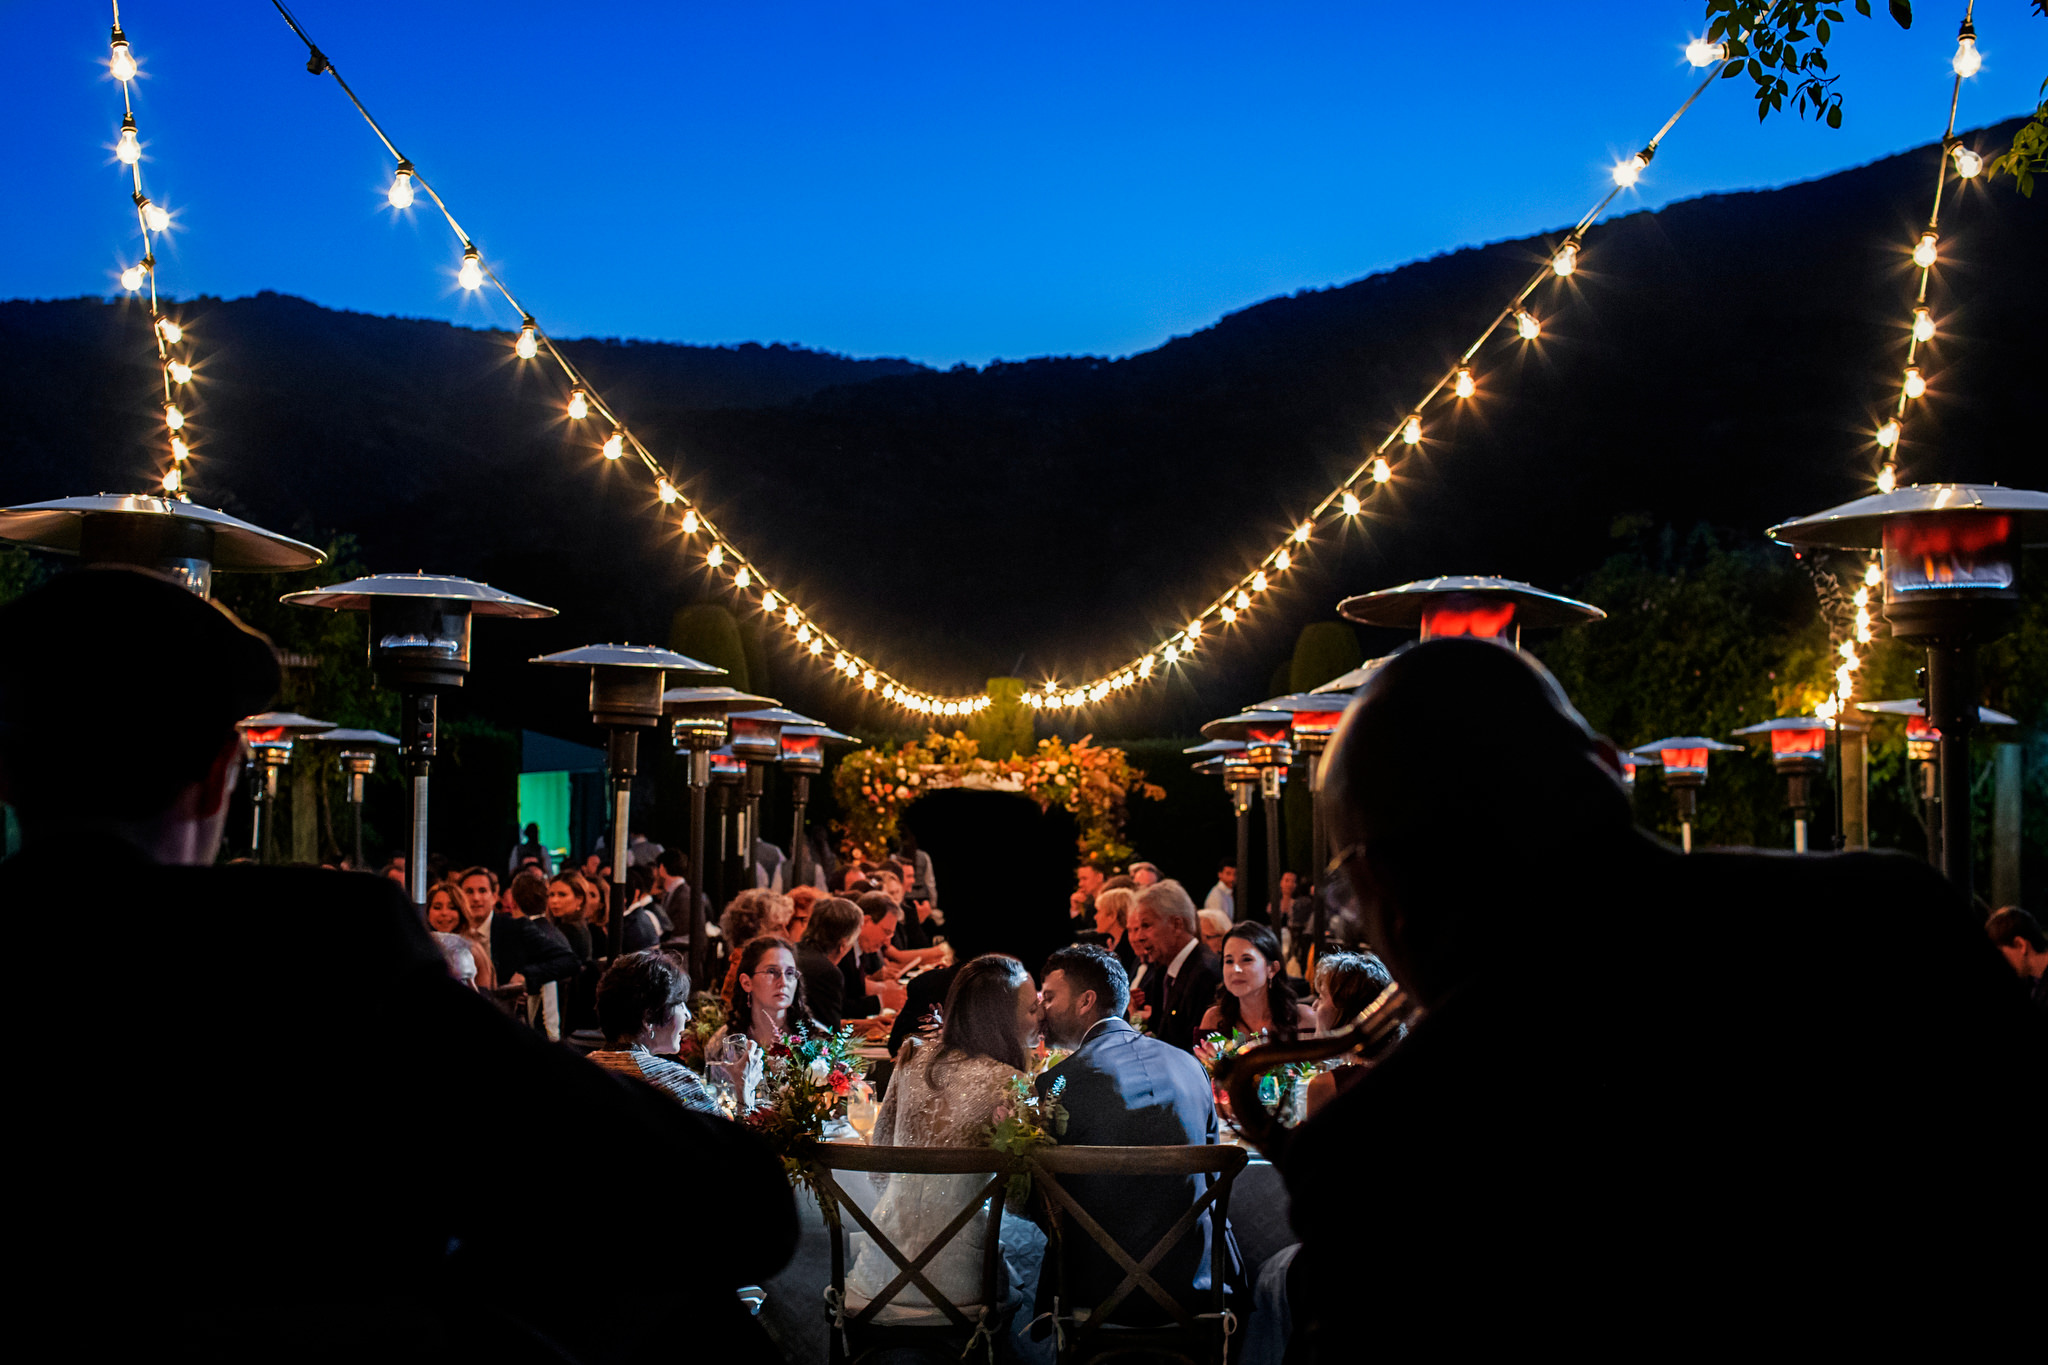 19-lynn-jimmy-carmel-valley-wedding-bernardus-lodge